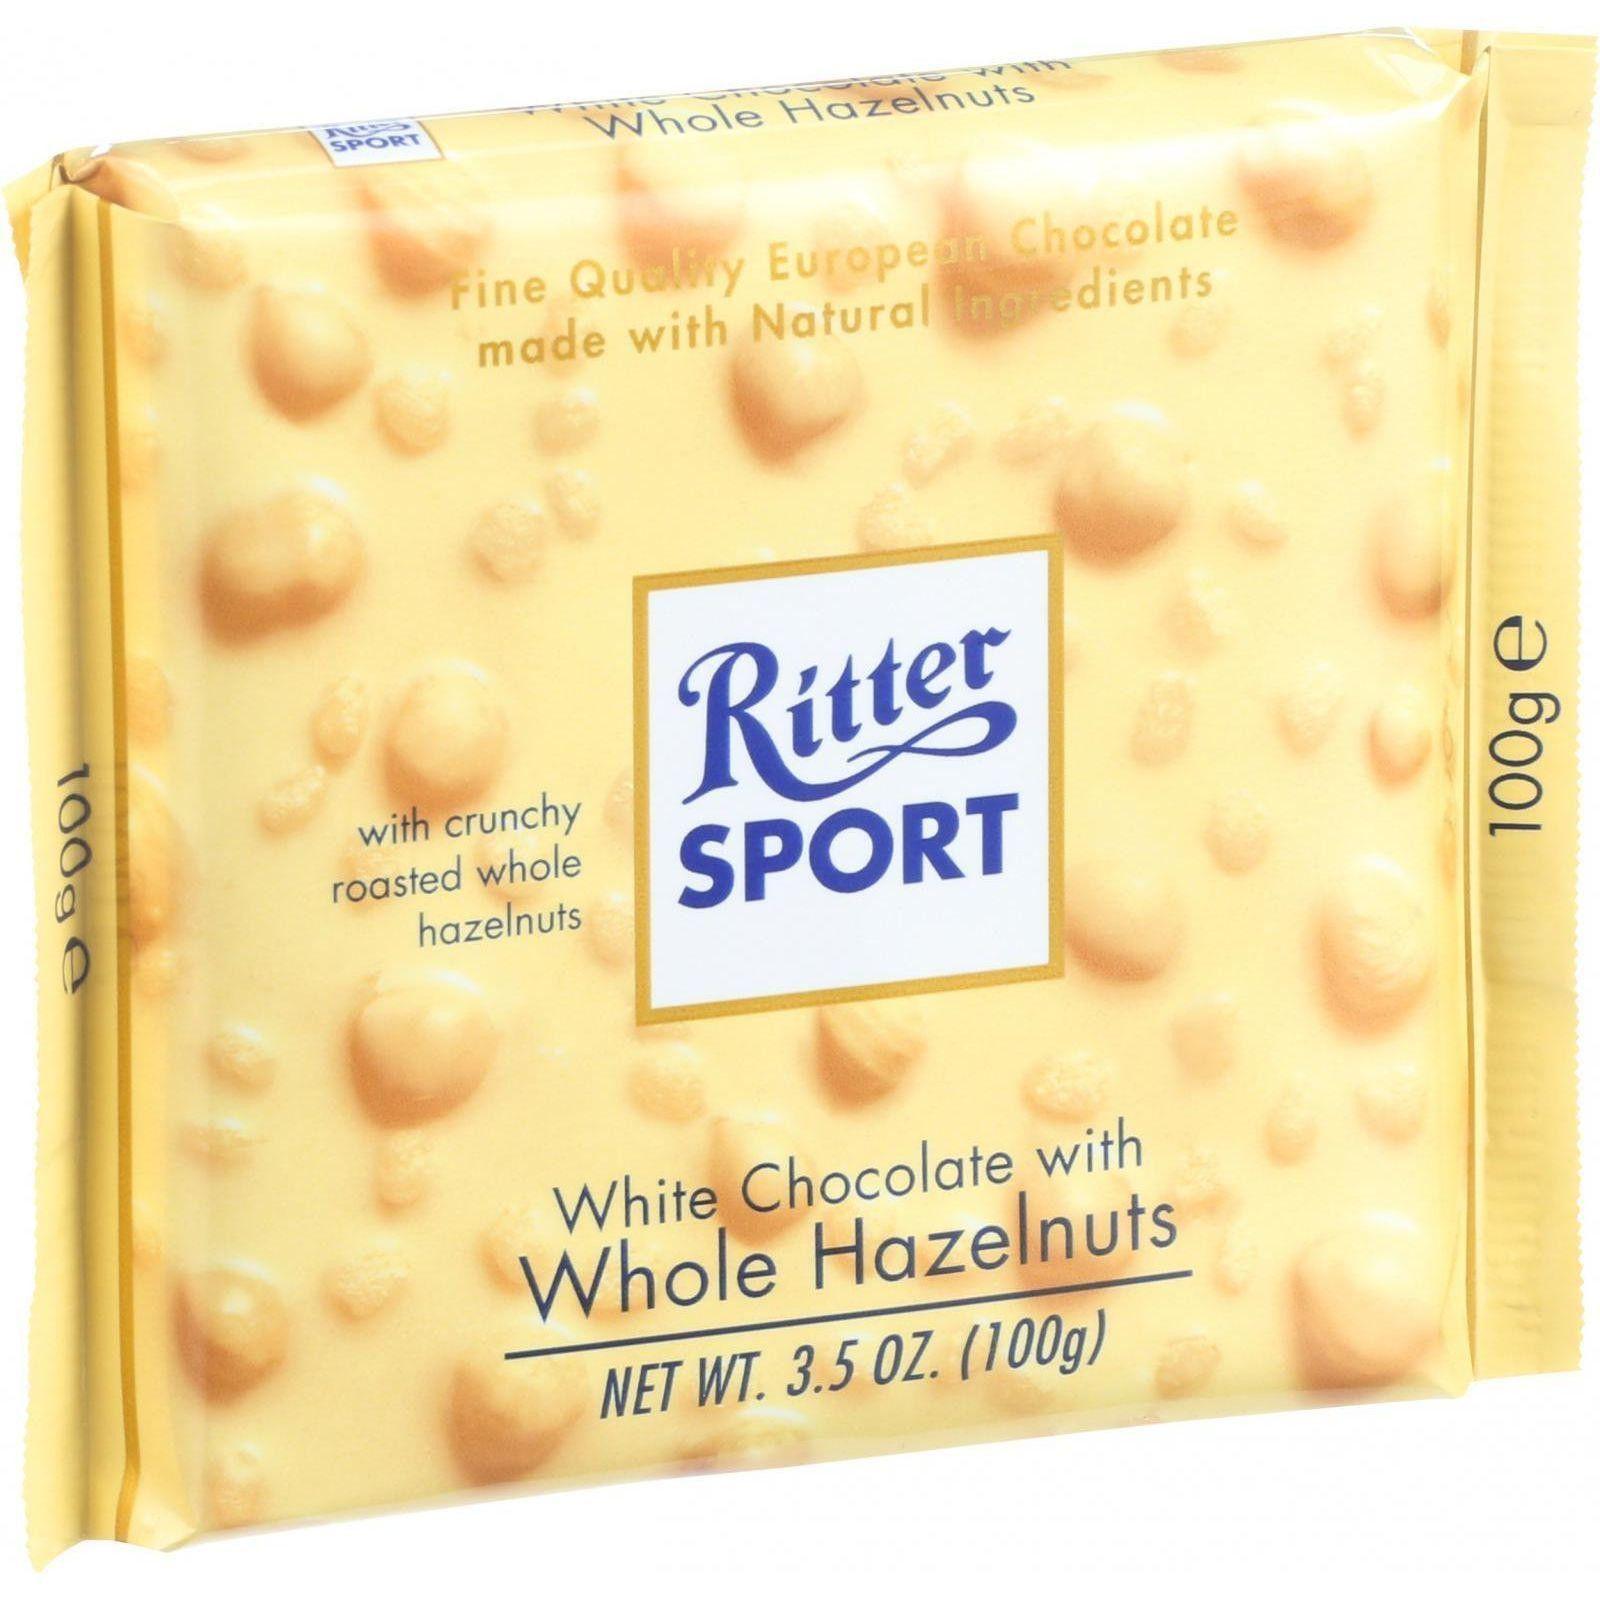 Ritter Sport Chocolate Bar White Chocolate Whole Hazelnuts